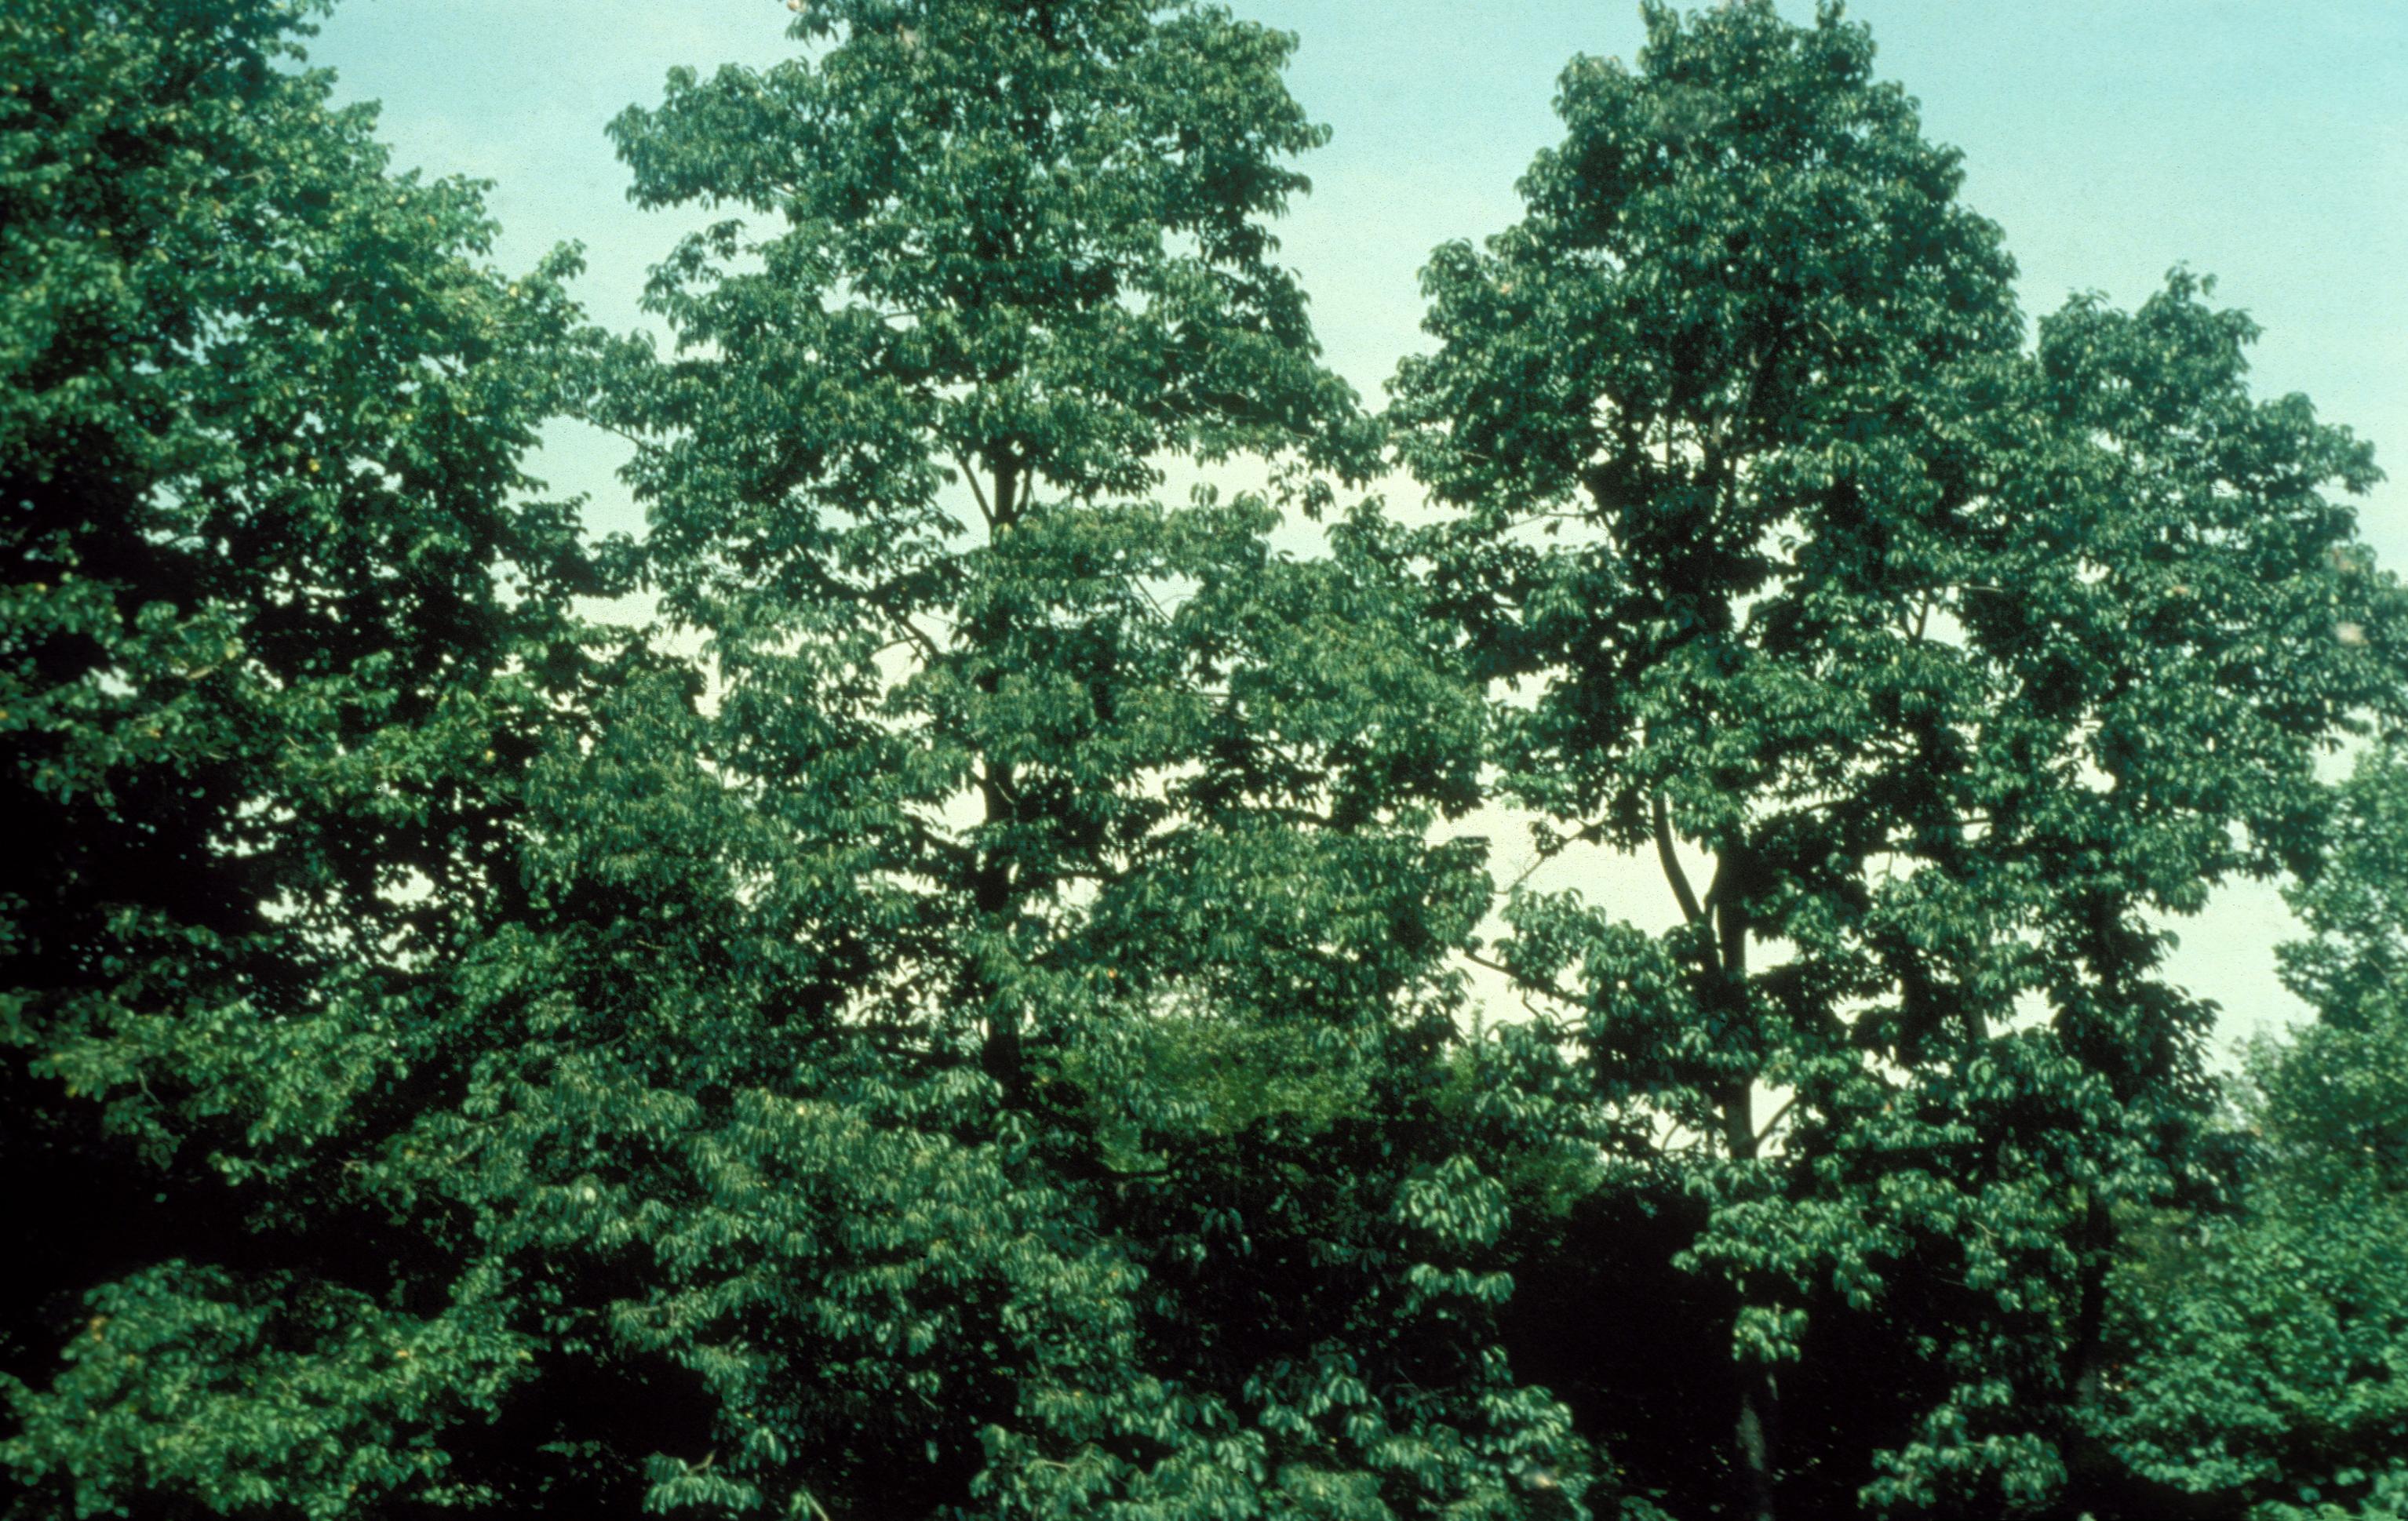 The Black Gum tree is the perfect all-season tree.